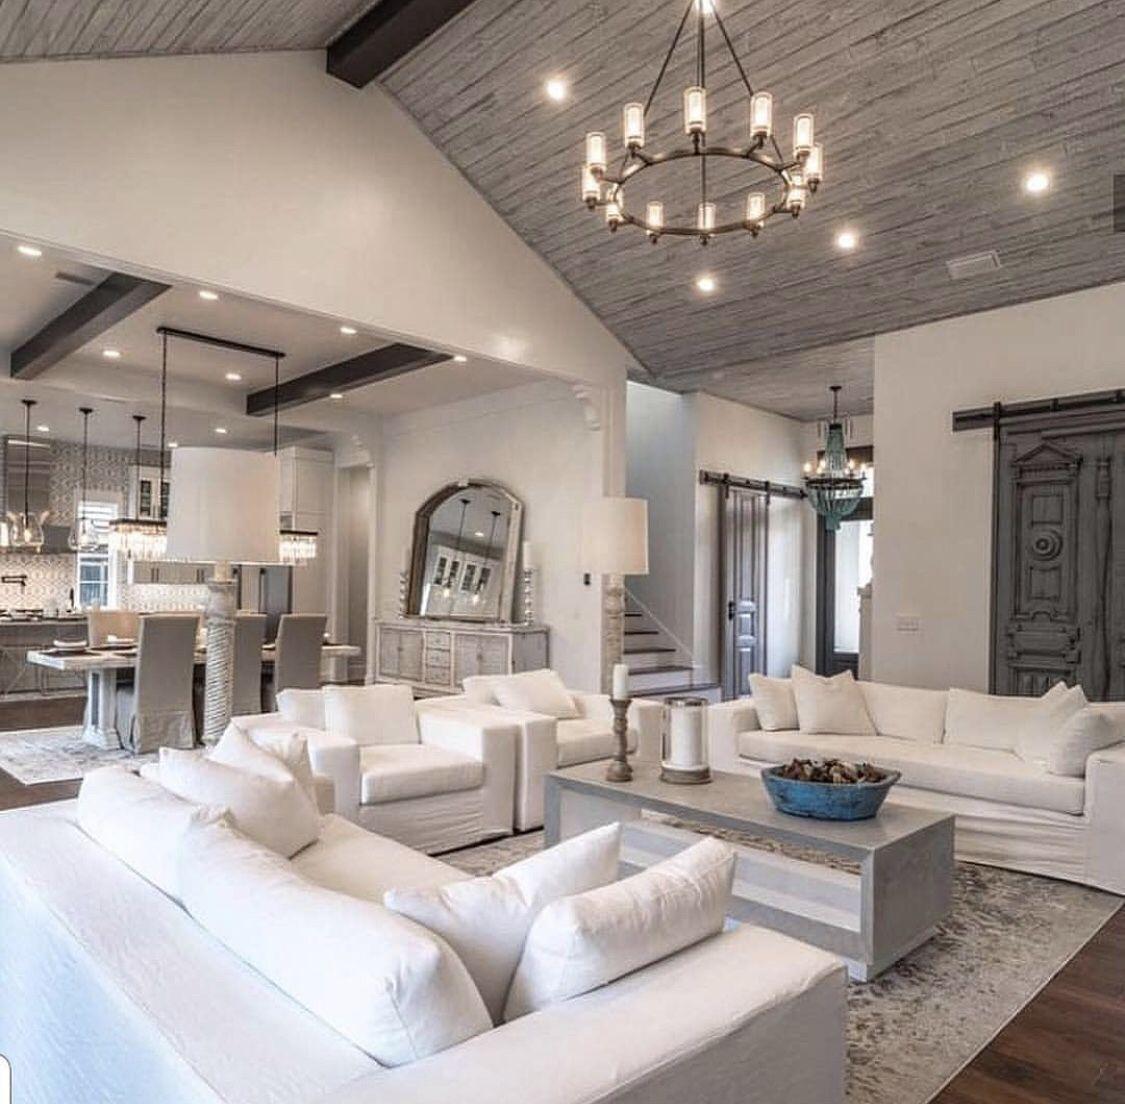 Bowie Wooden Floor Lamp By Lillian Home Decor Decorative Floor